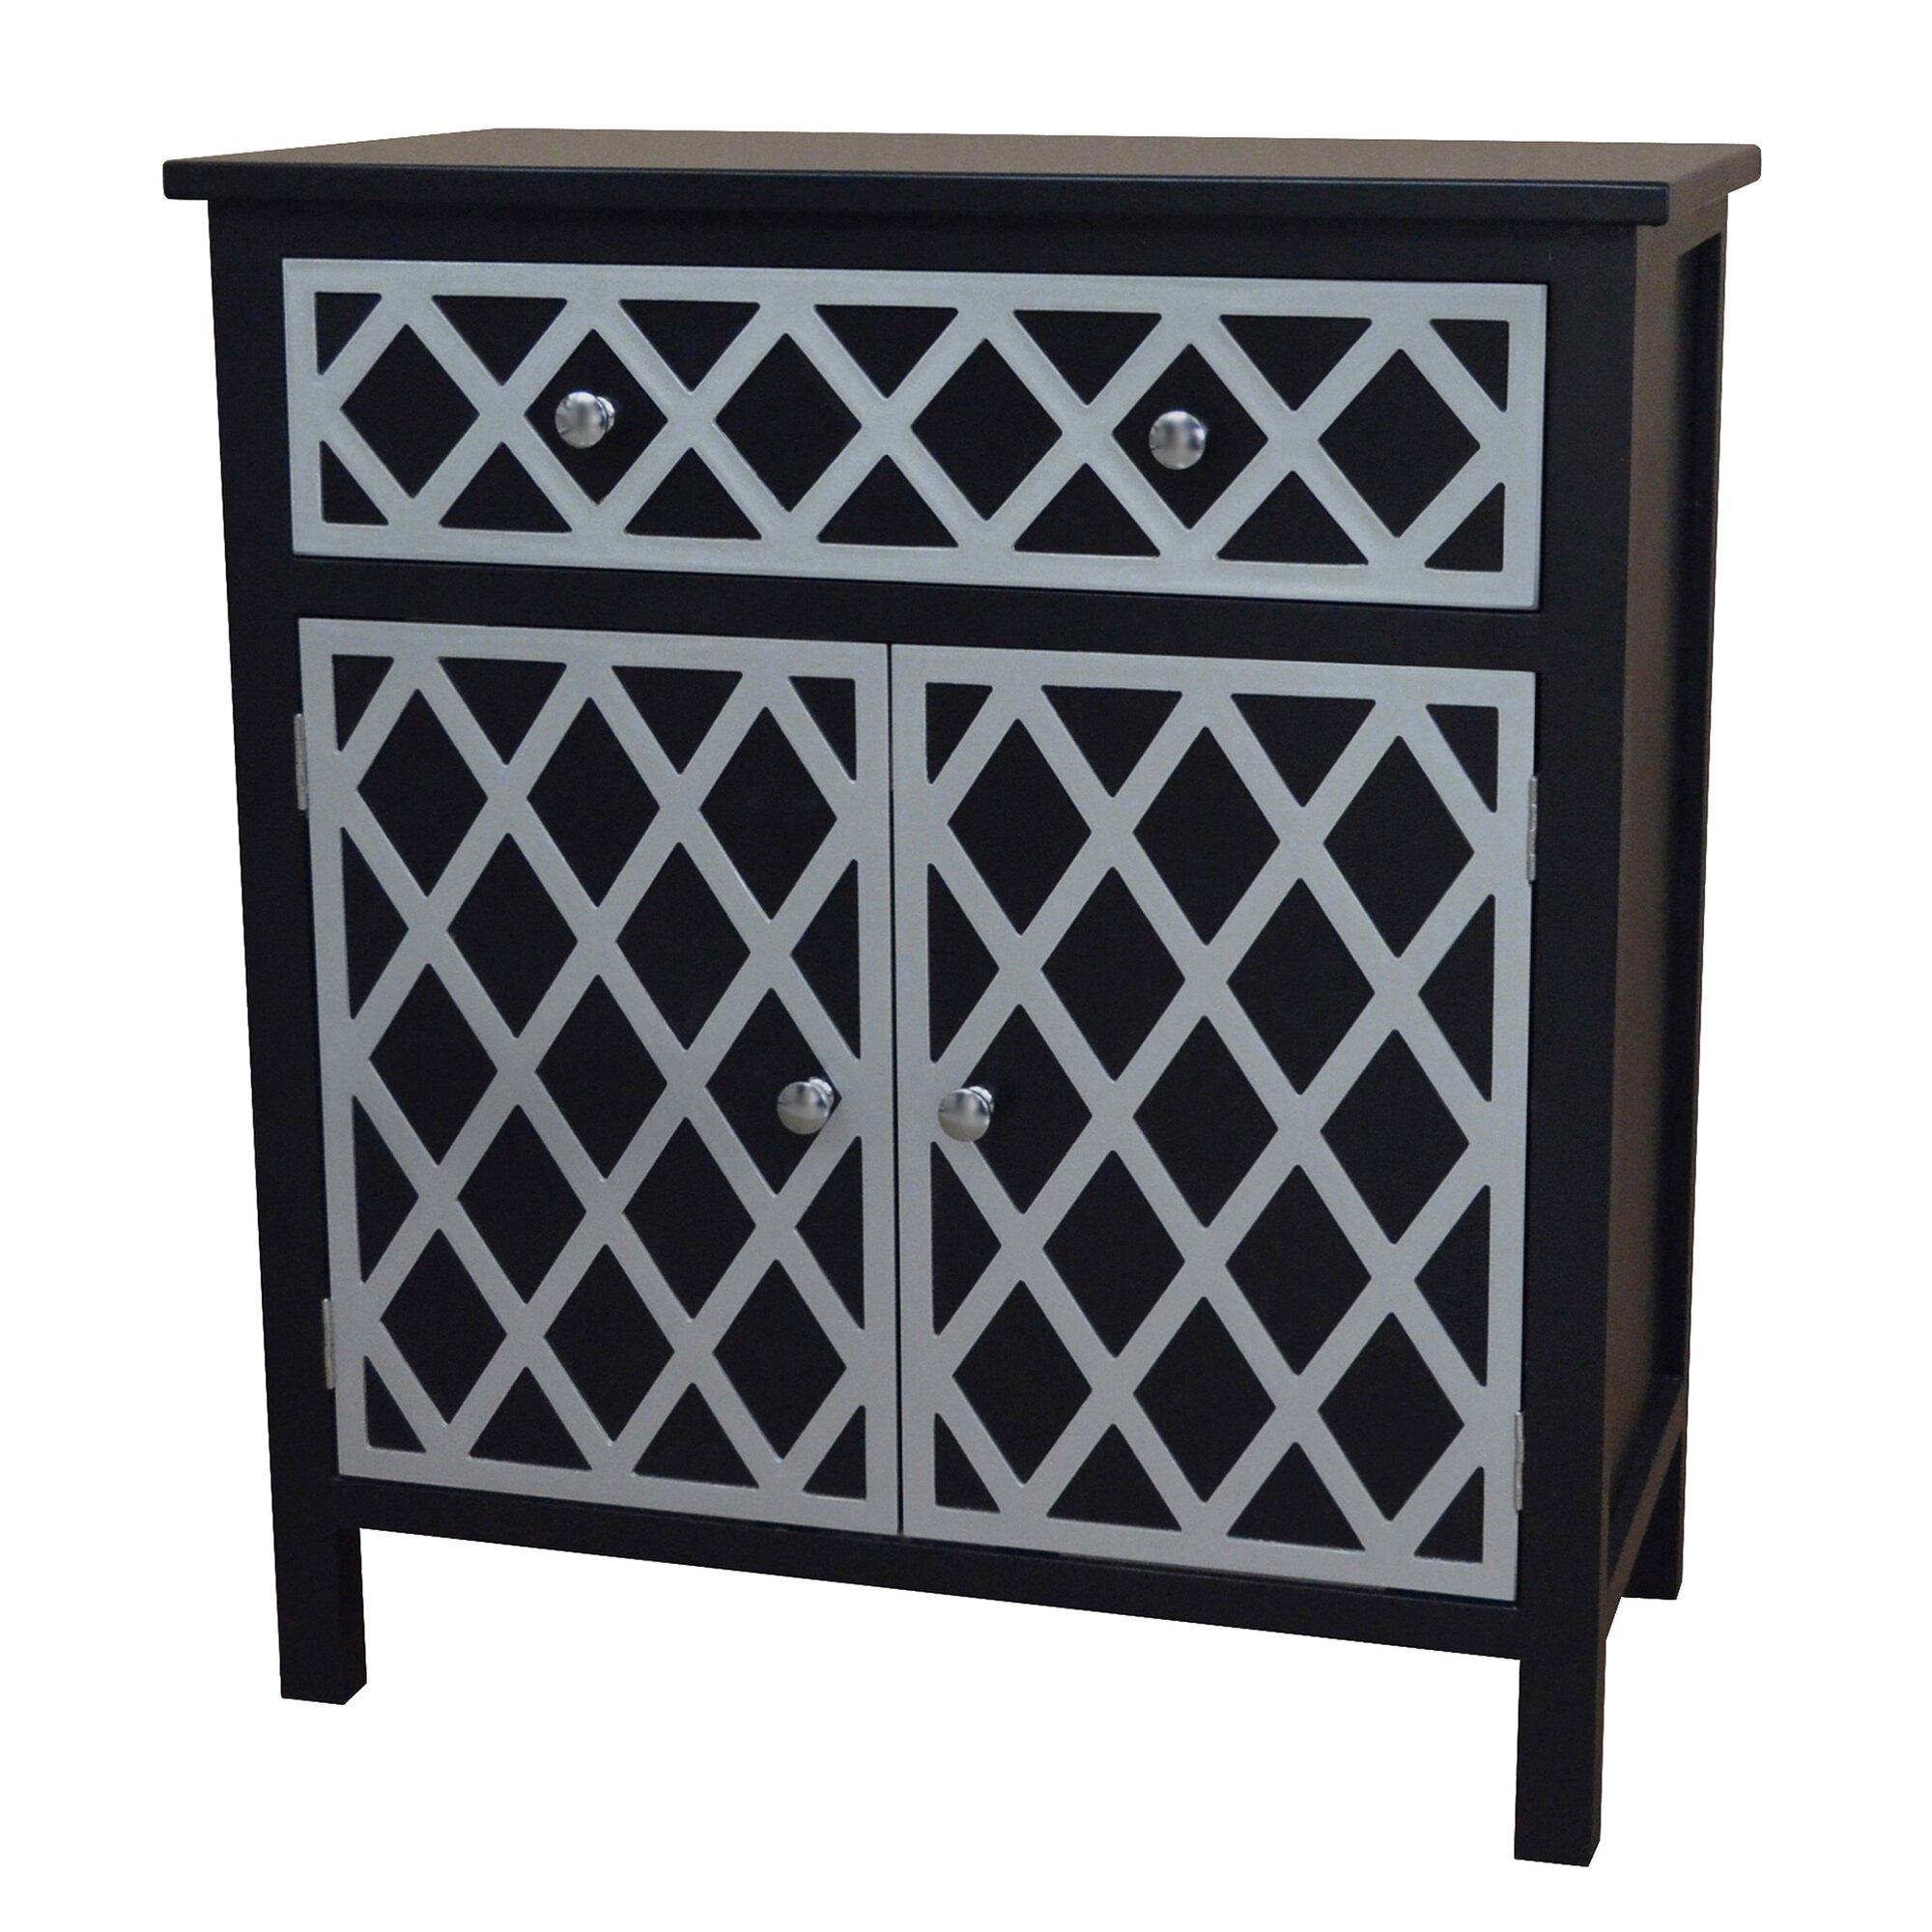 Gallerie decor trellis cabinet 1 drawer and 2 door chest for 1 drawer 2 door cabinet